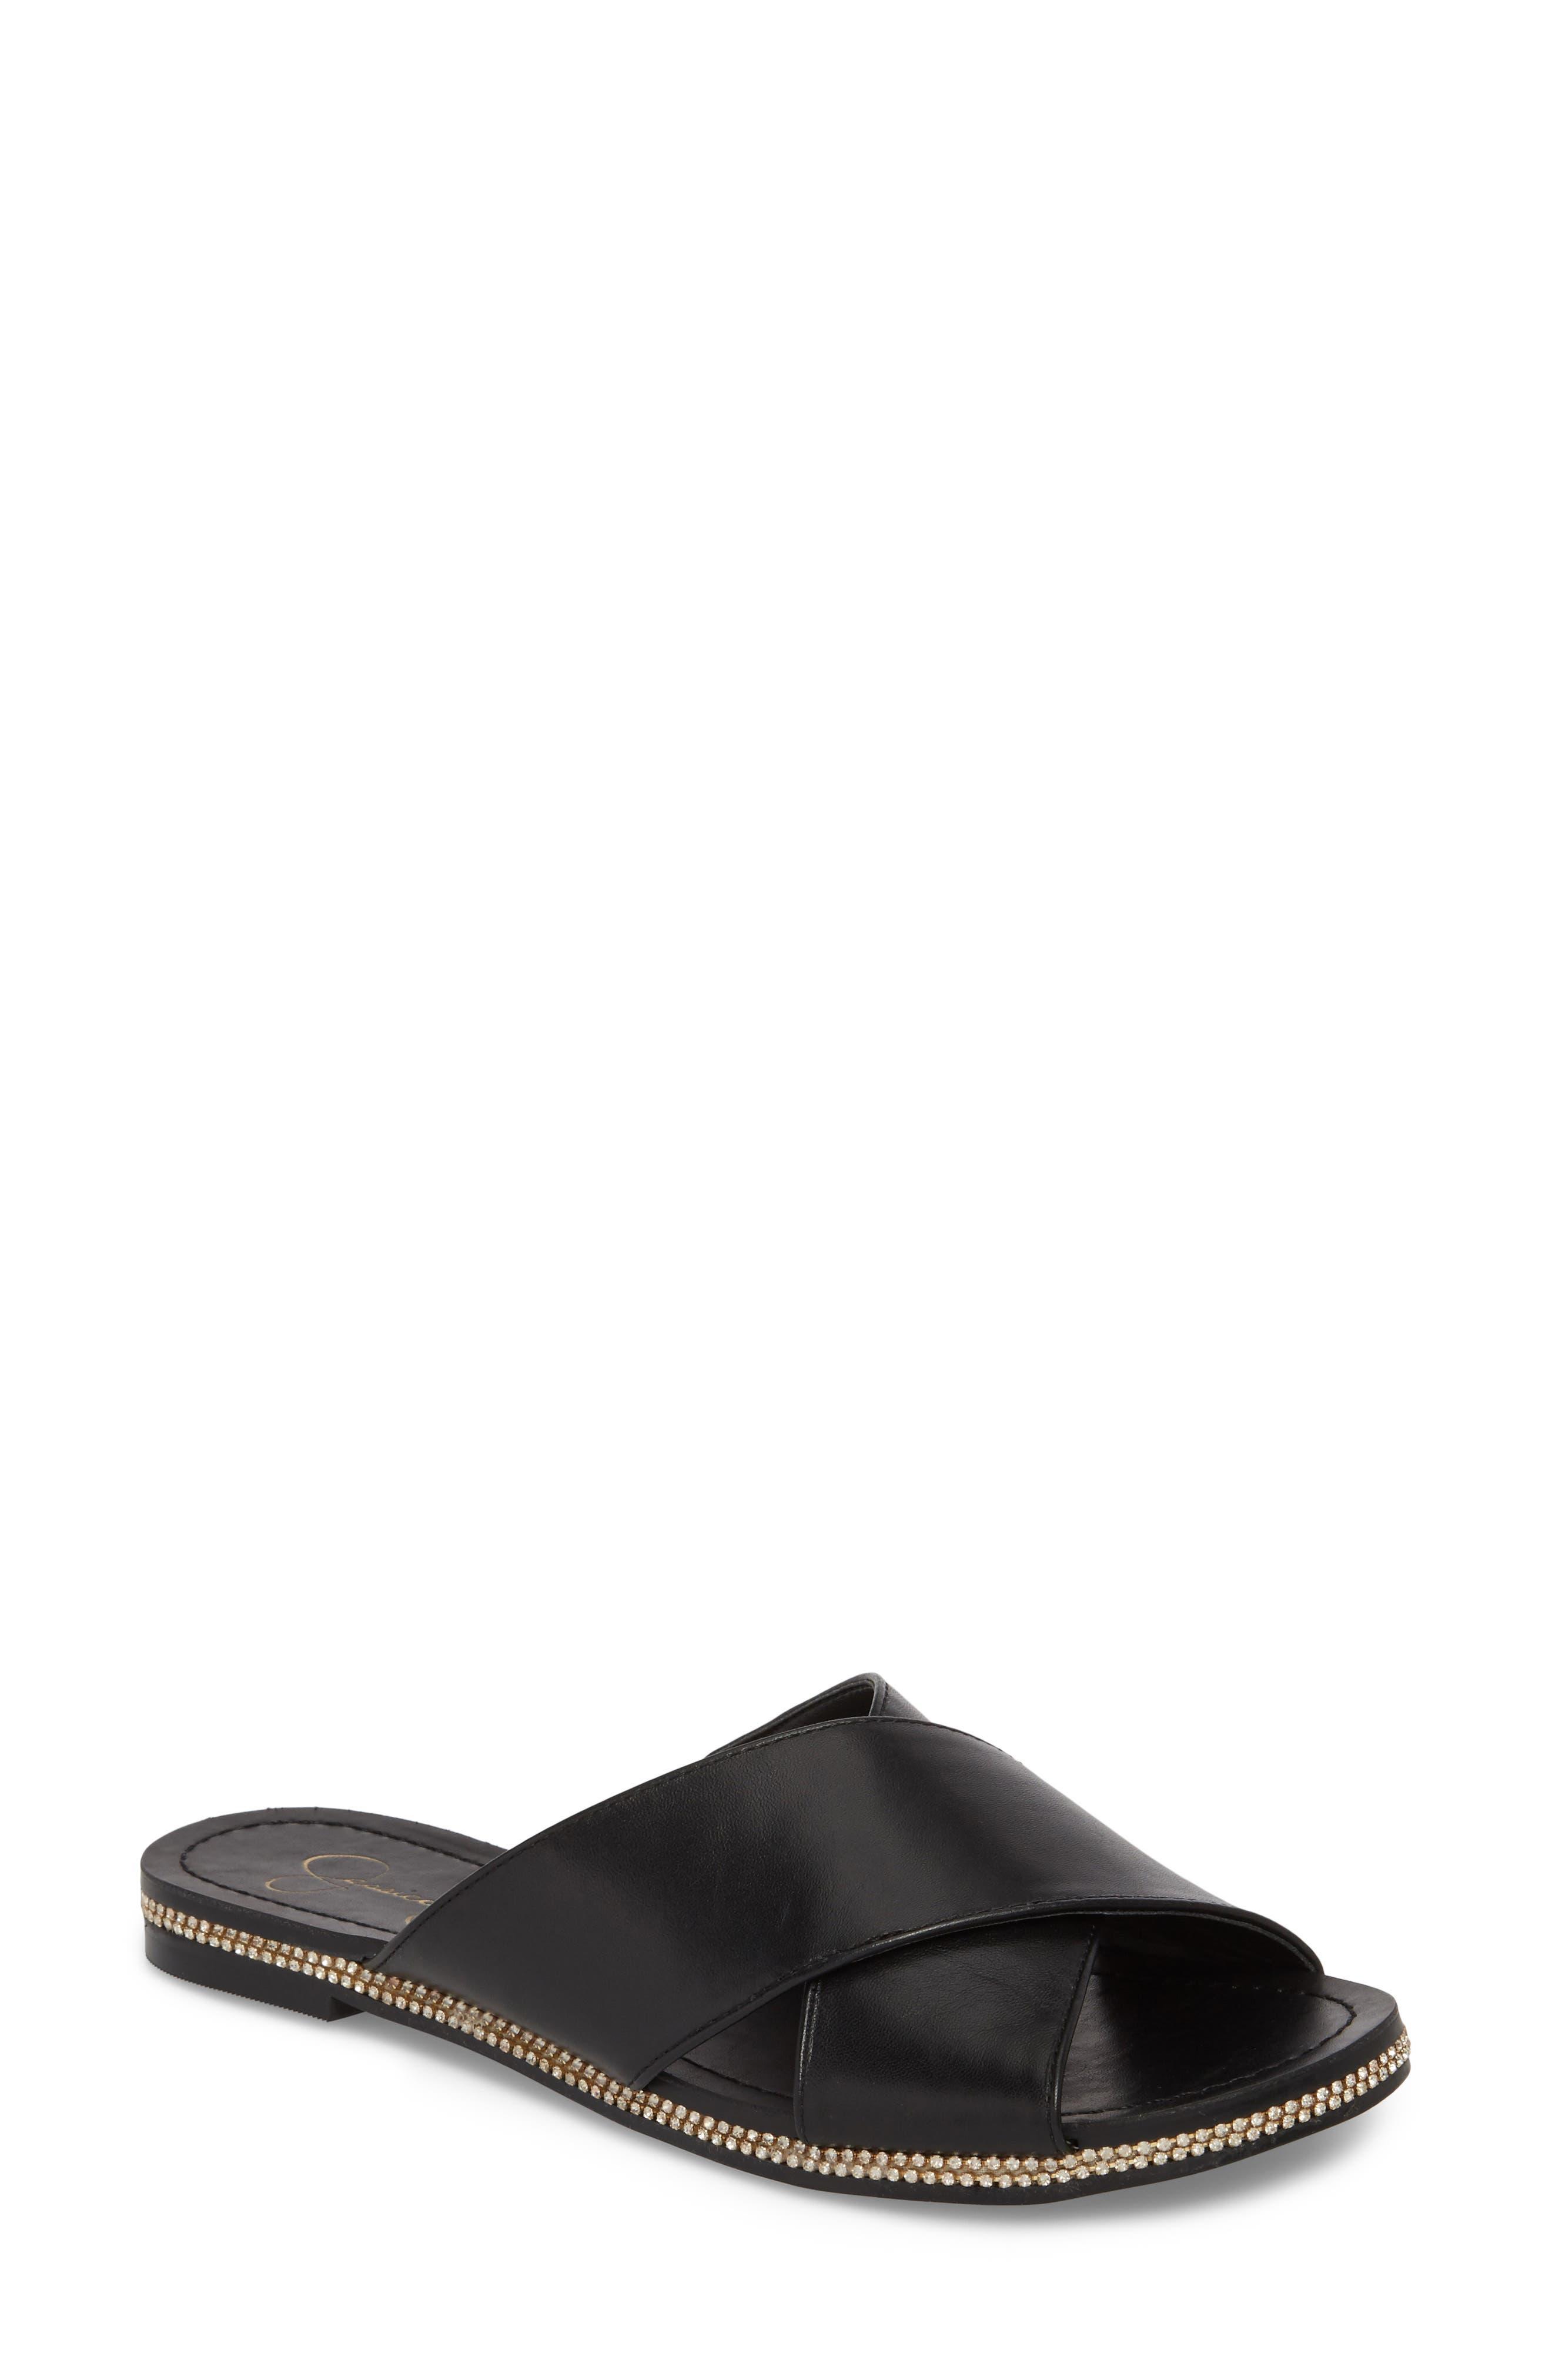 Brinella Sandal,                             Main thumbnail 1, color,                             Black